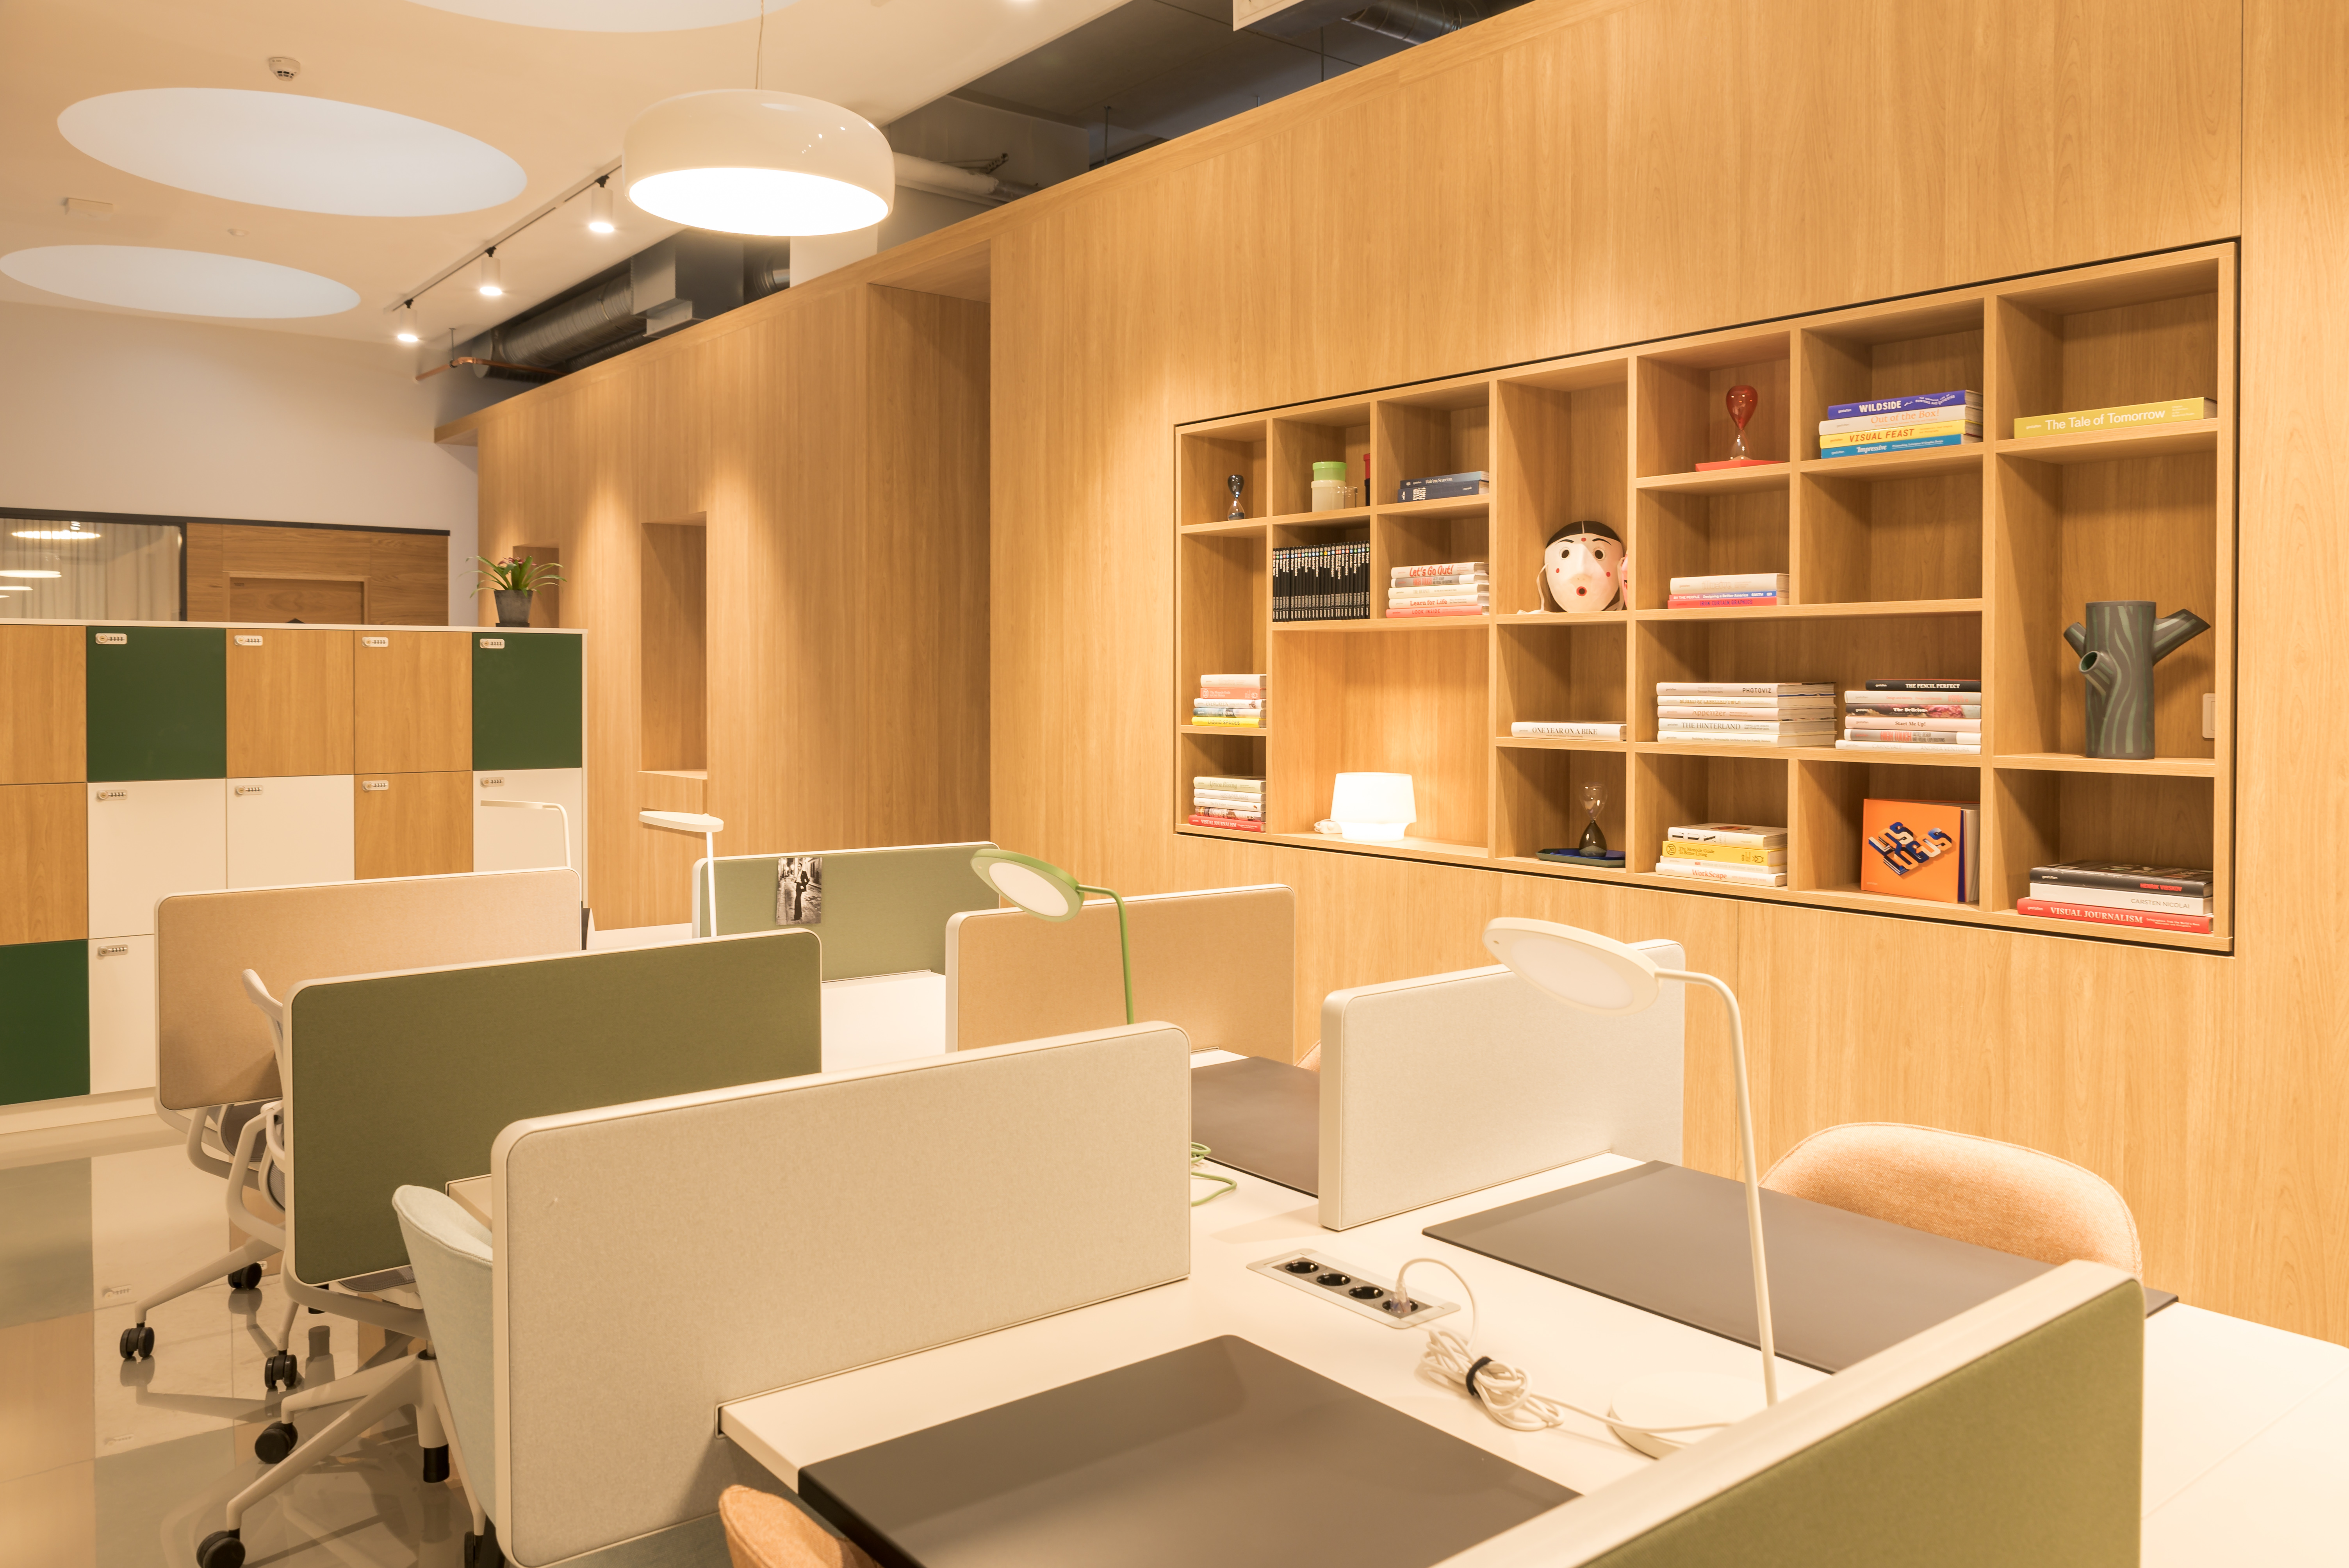 Spaces - Helsinki, Postitalo Spaces